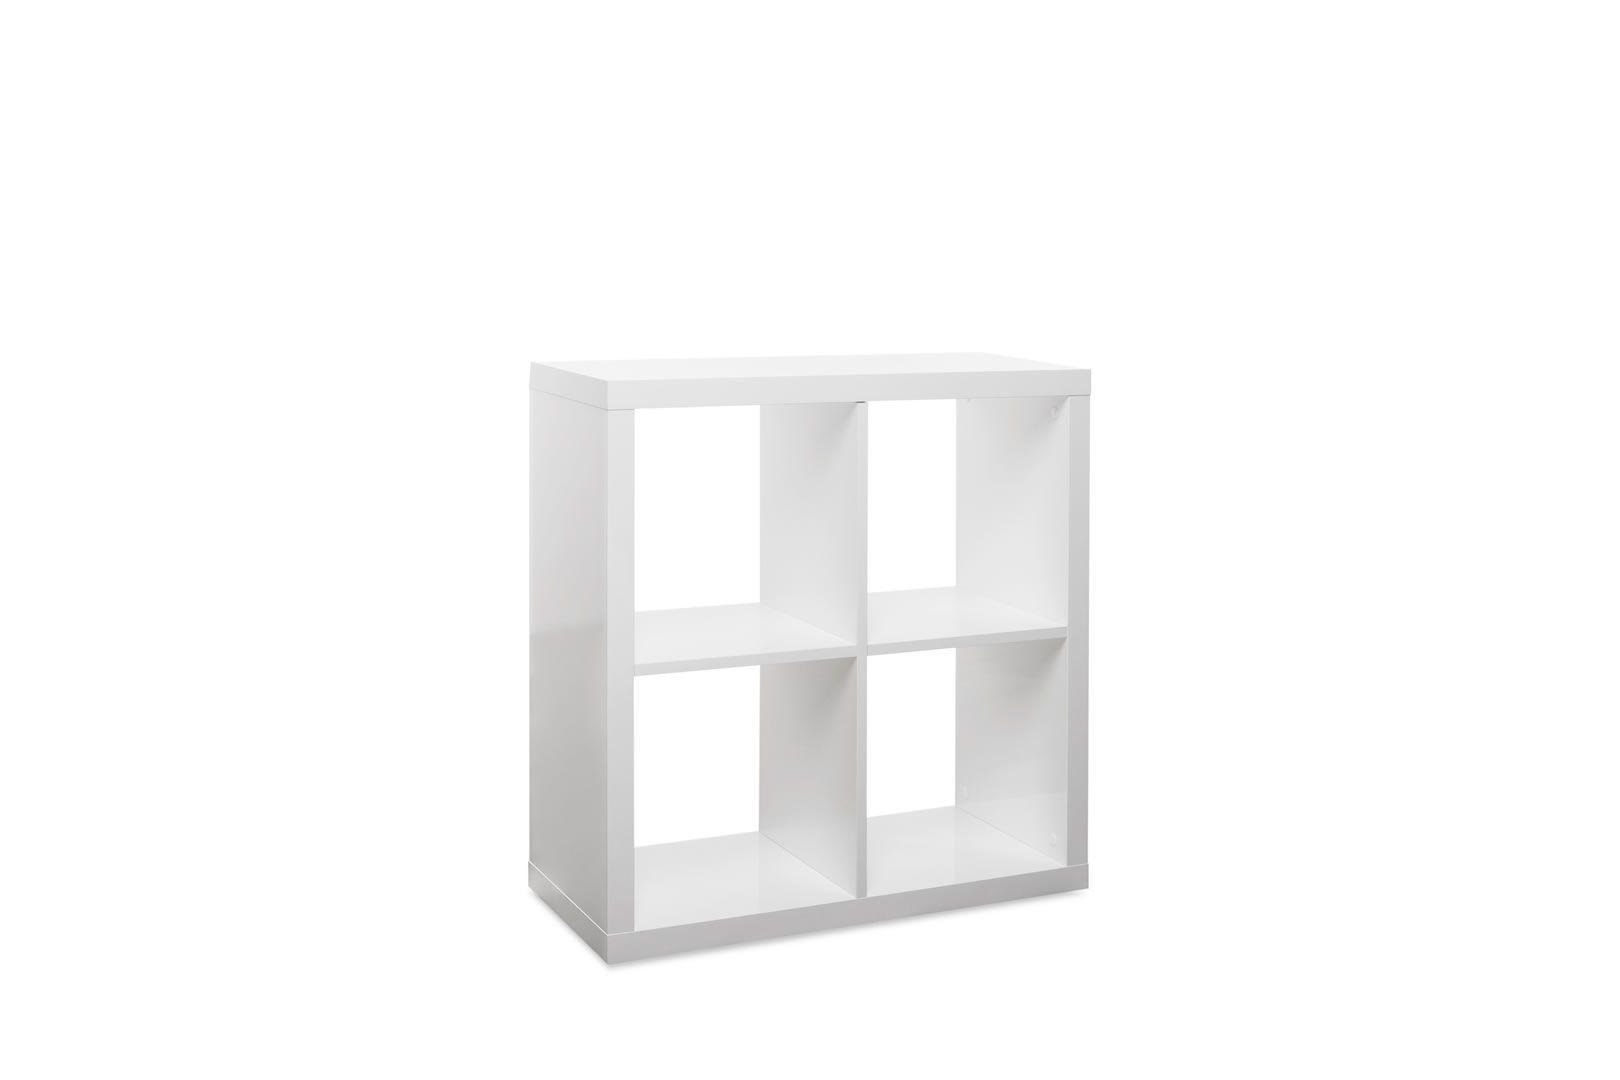 Etagere Murale Cube 4 Cases Blanc Brillant Lana